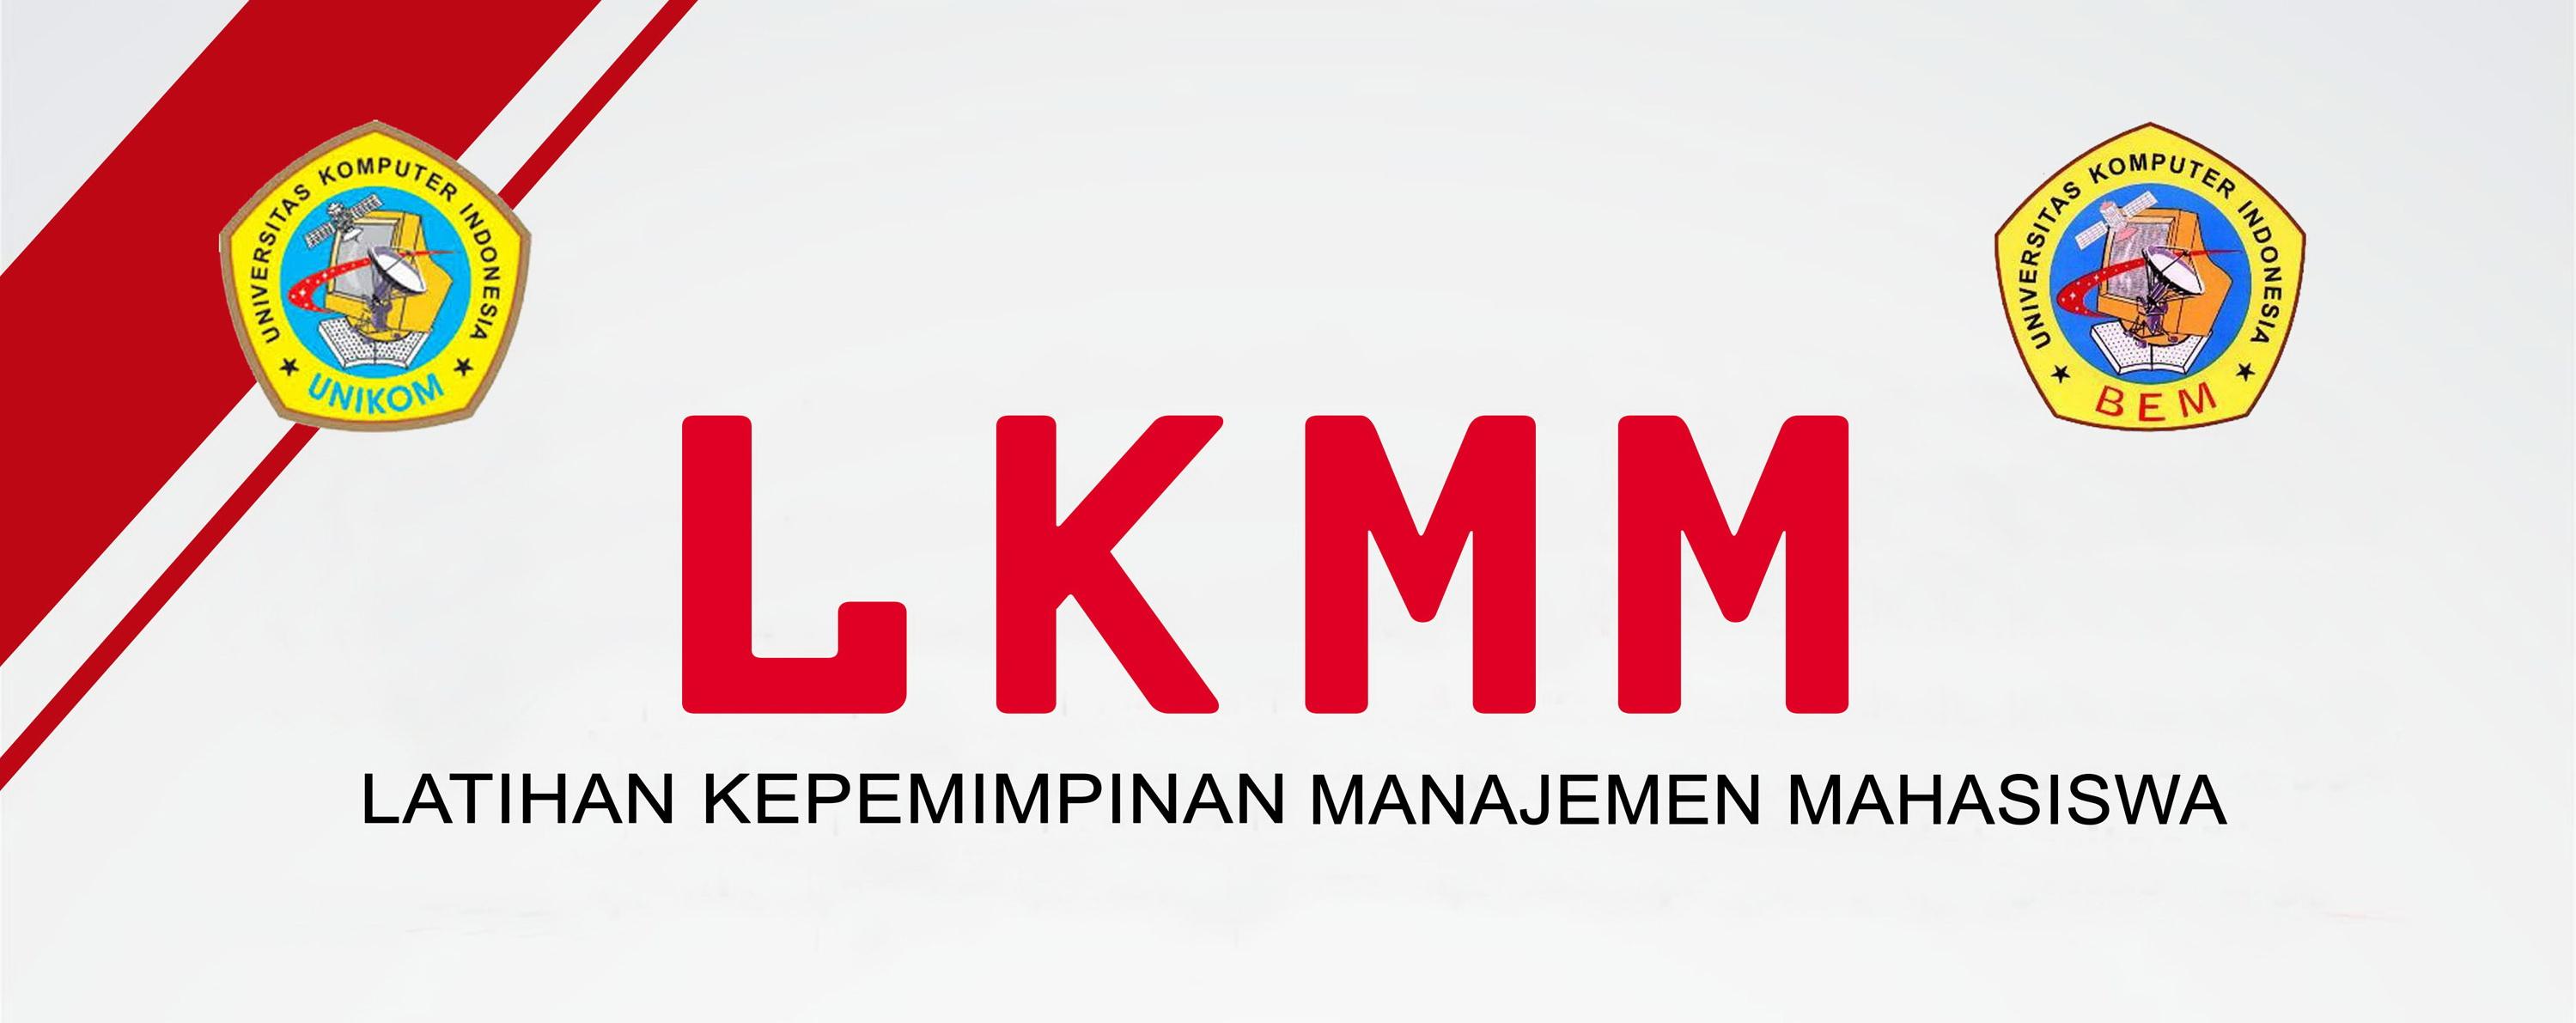 Latihan Kepemimpinan Manajemen Mahasiswa